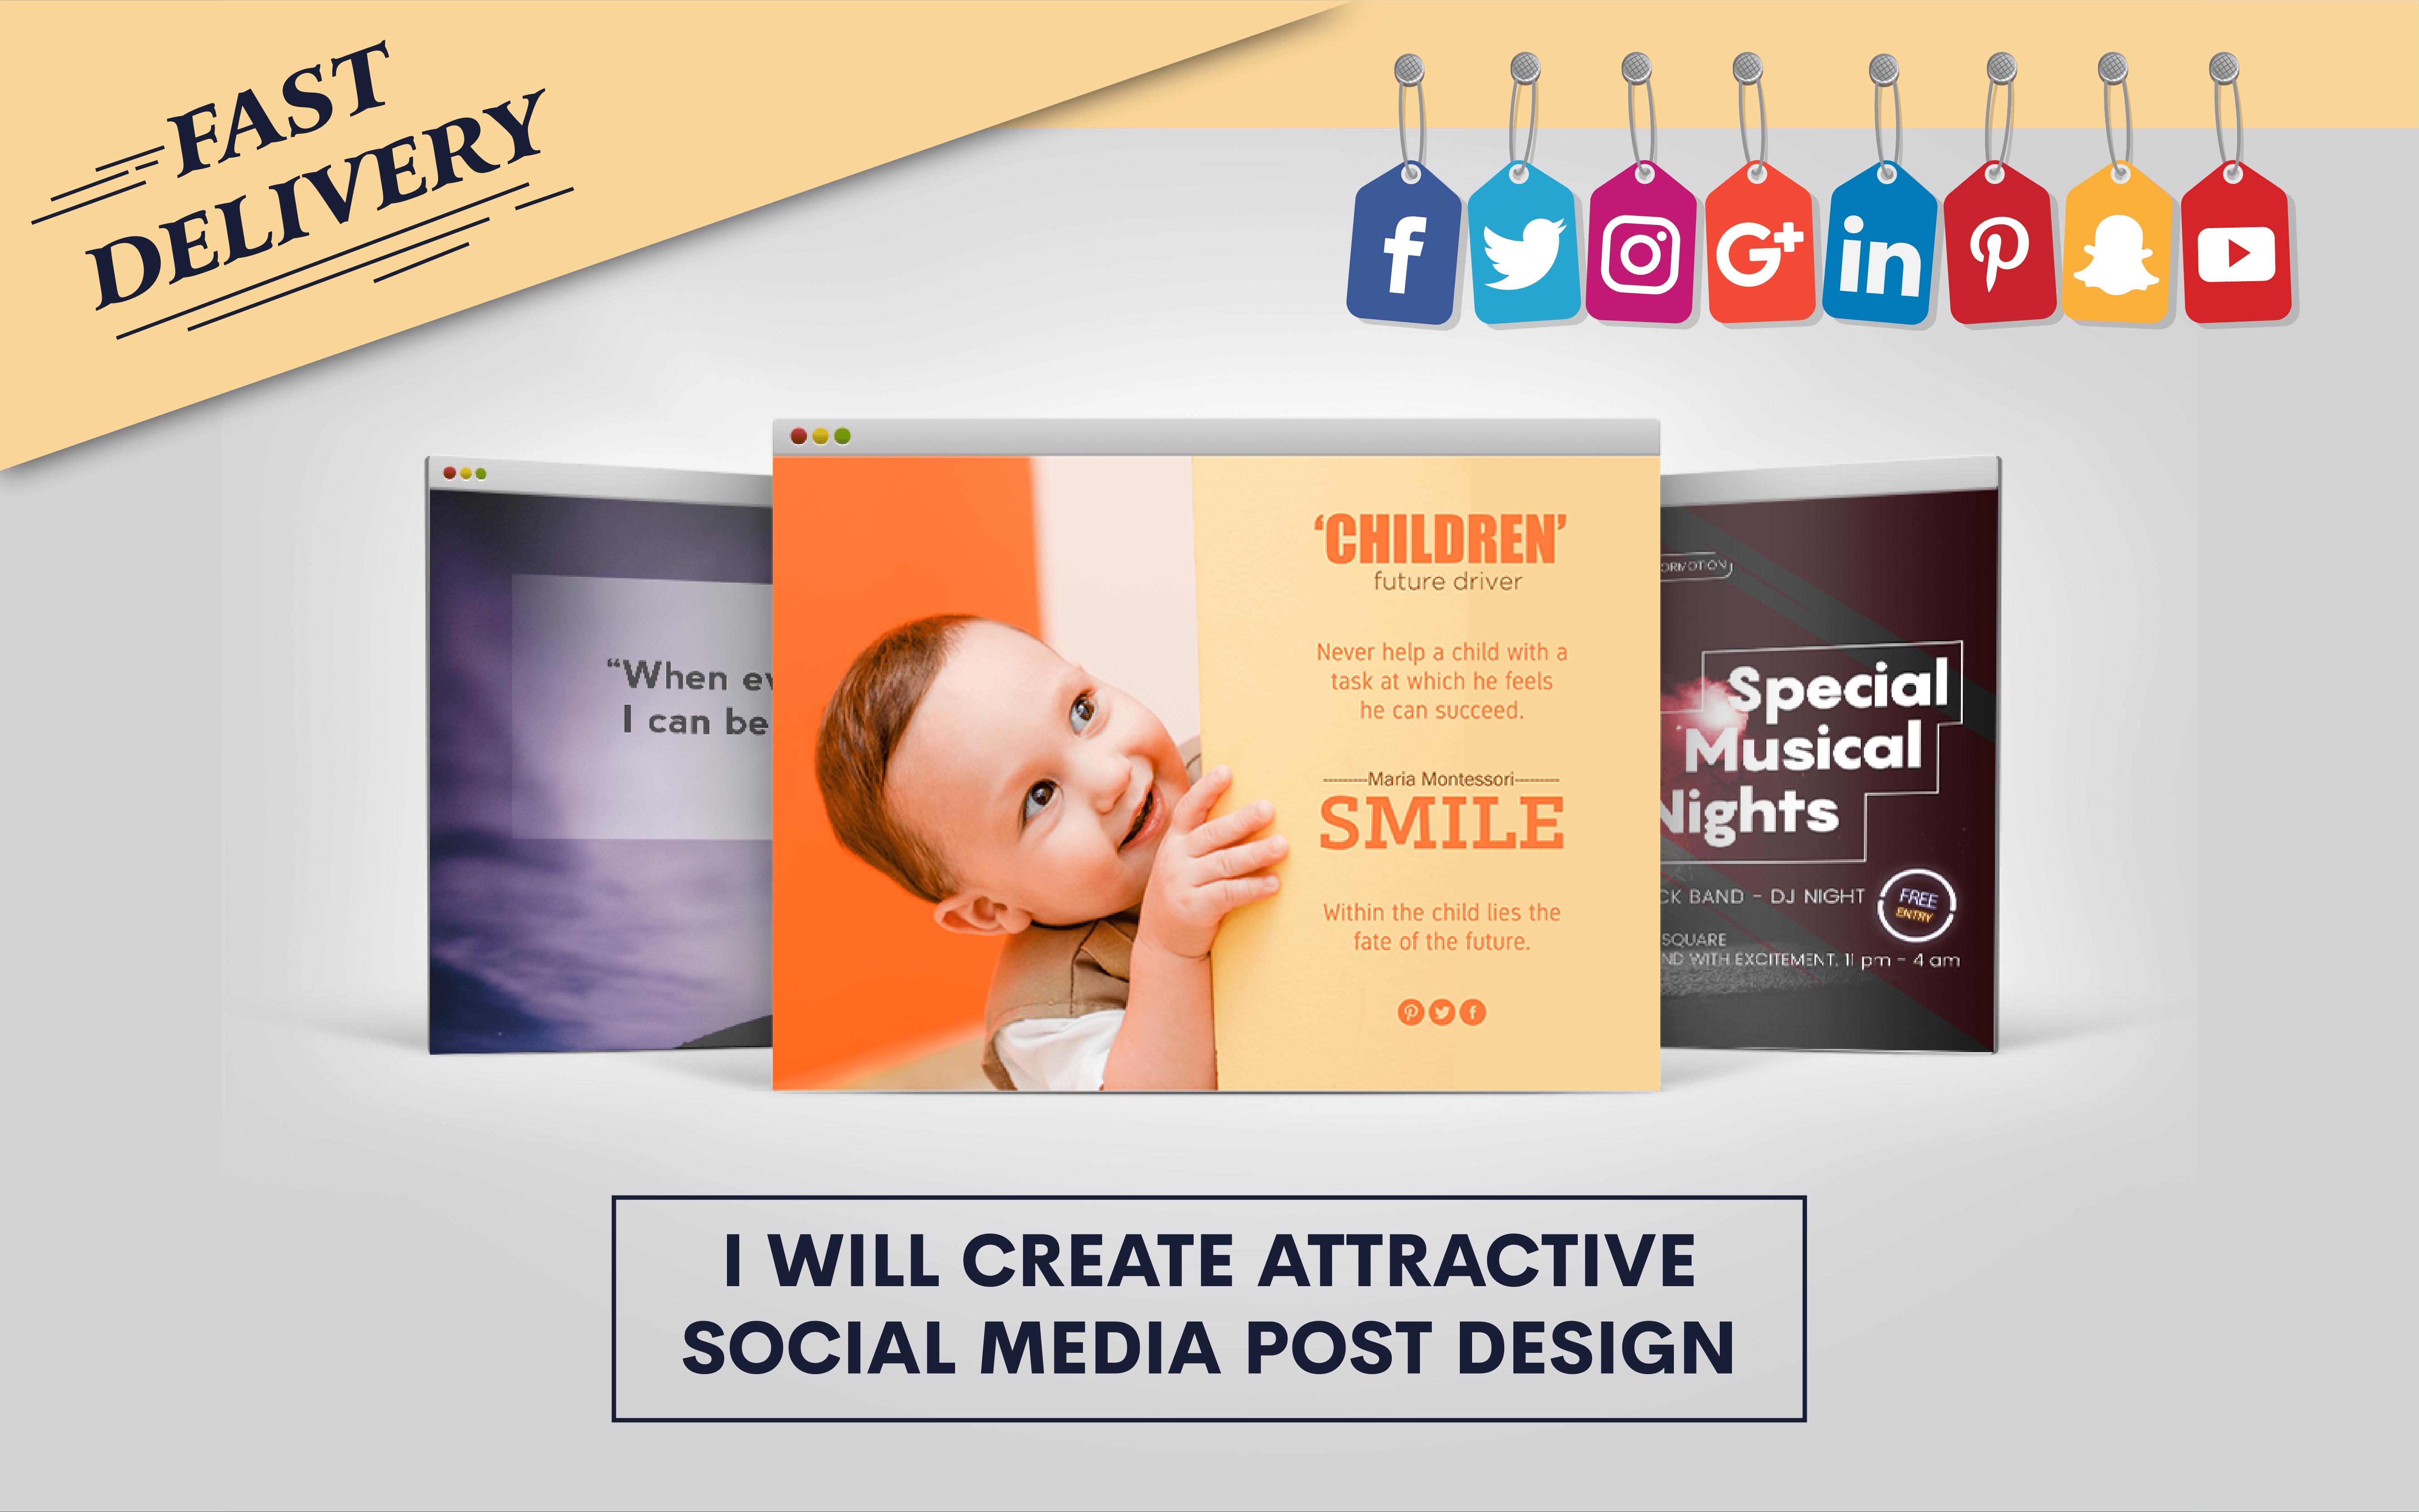 I will create 5 arttractive social media posts design